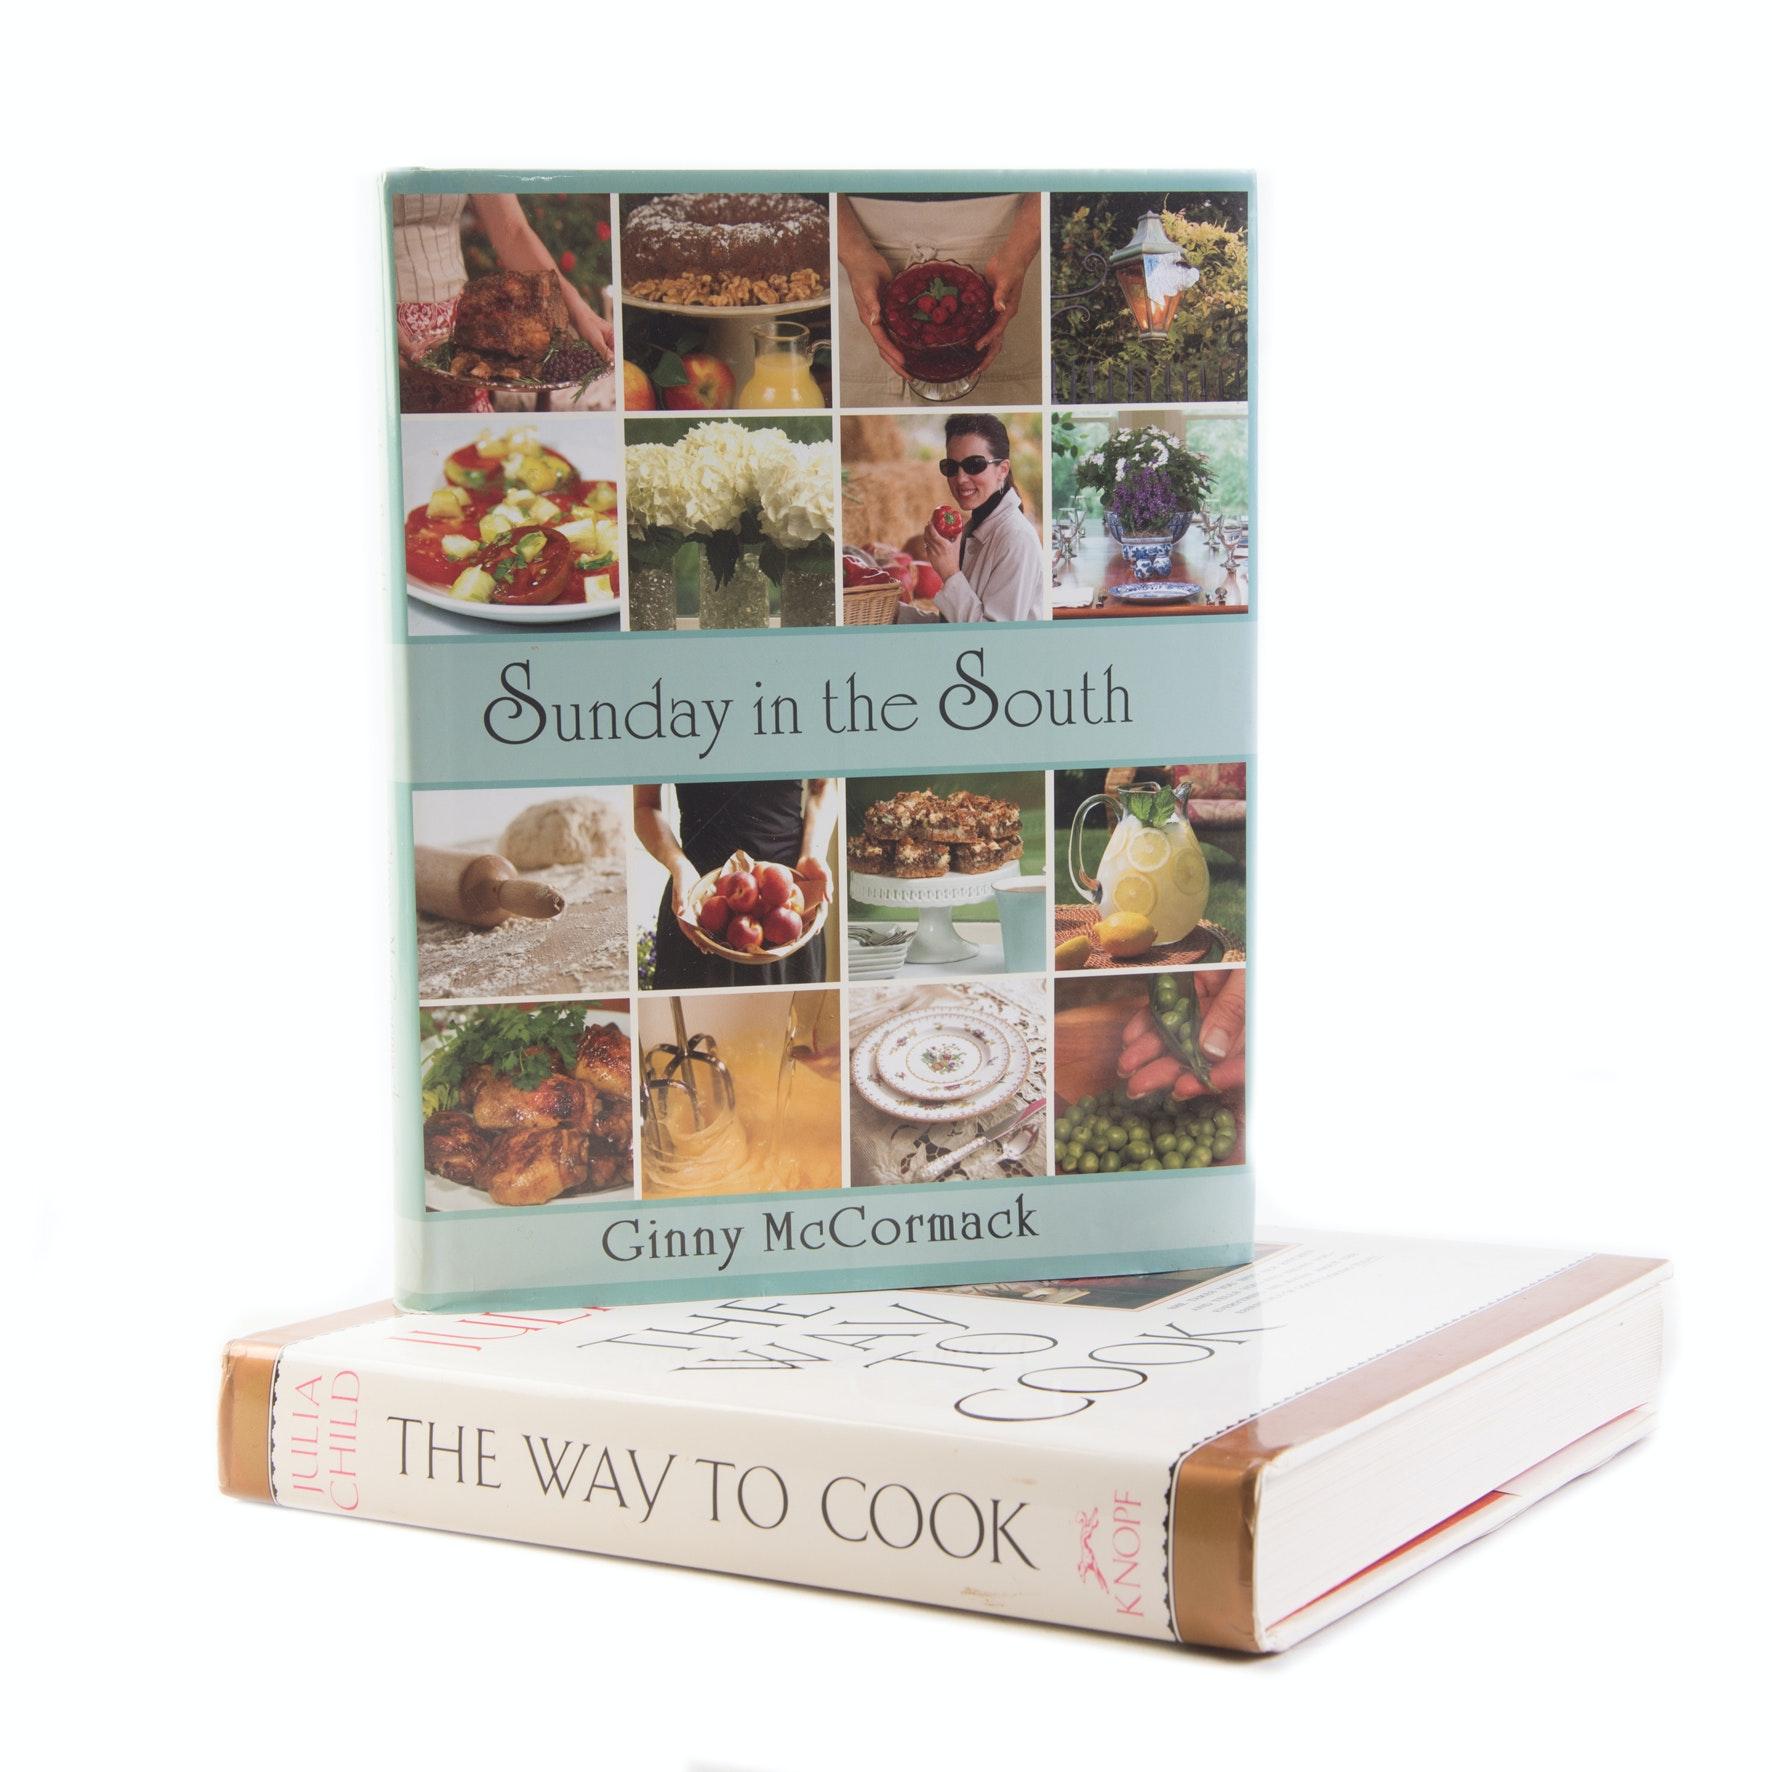 Julia Child and Ginny McCormack Cookbooks